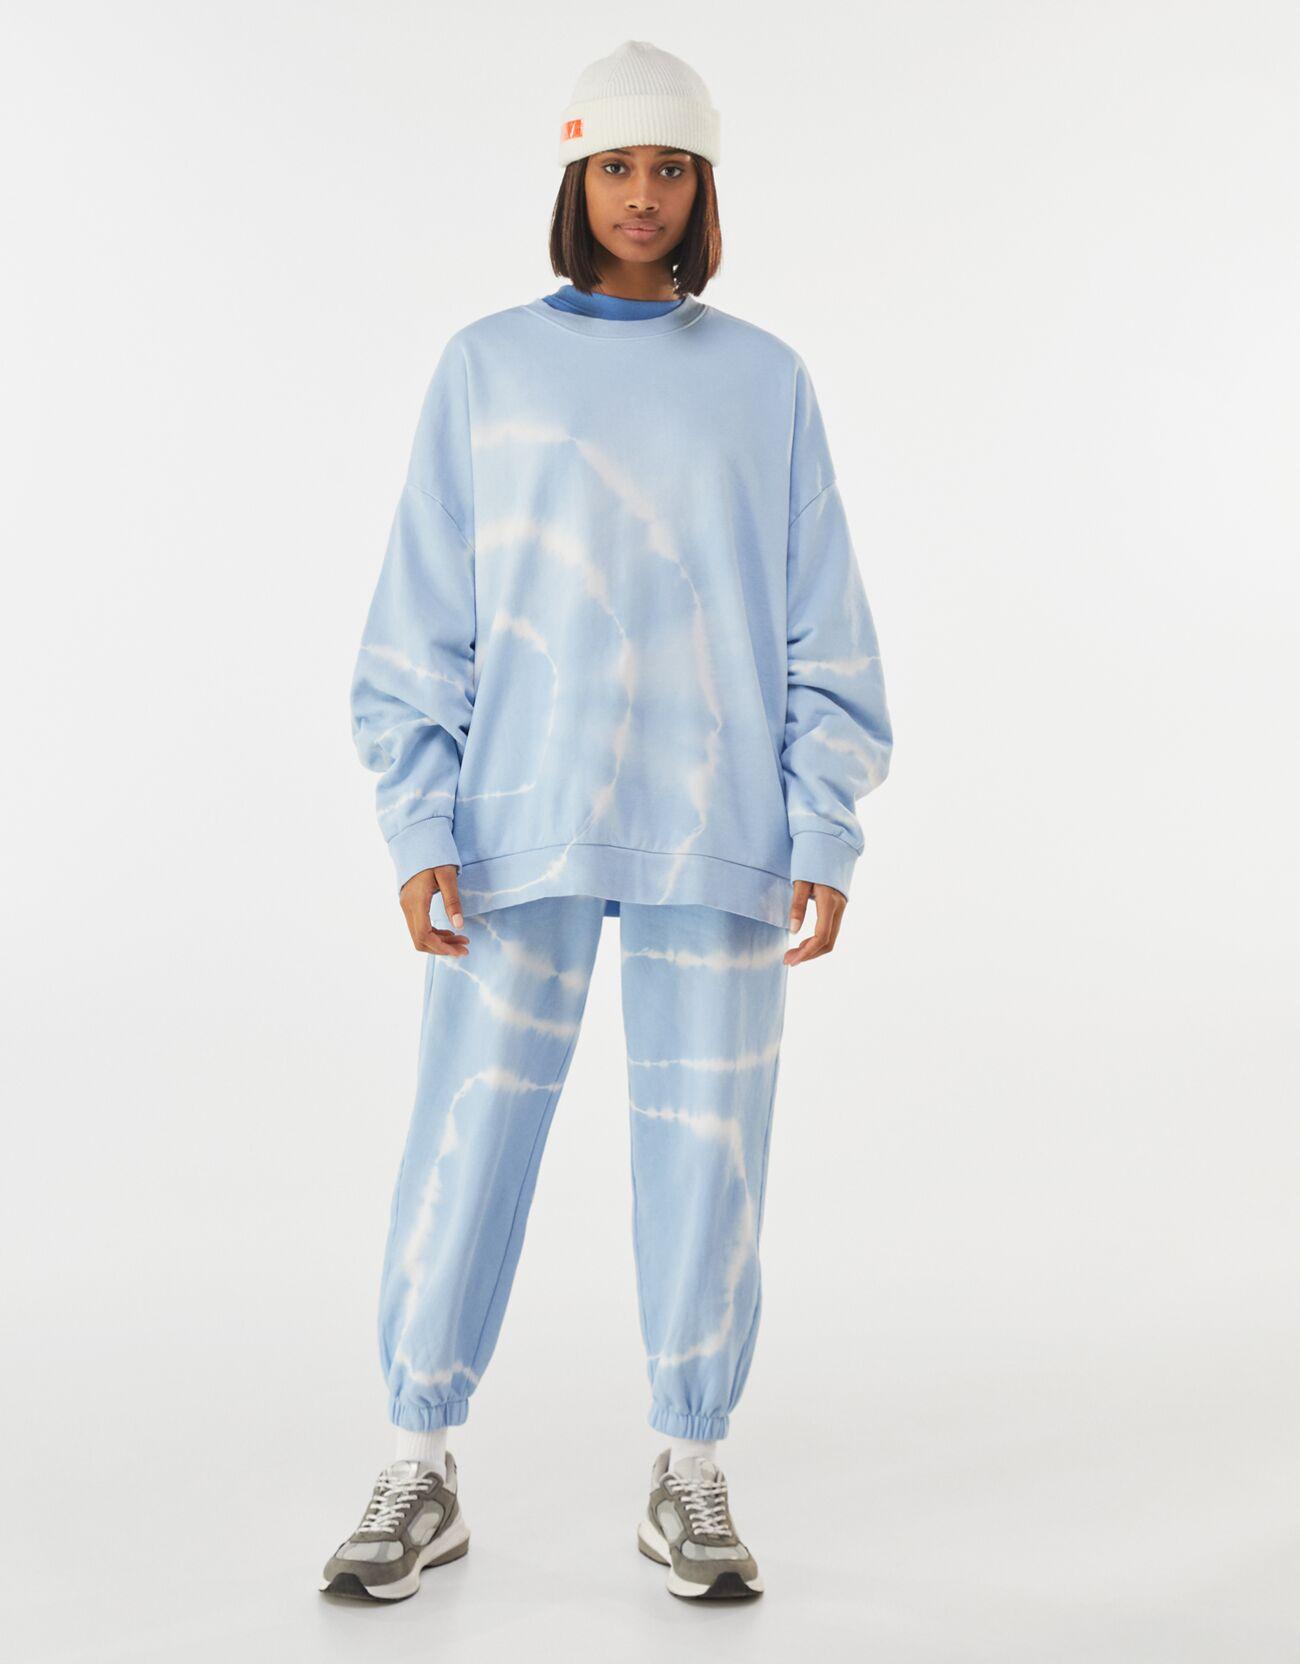 Sudadera oversize tie-dye en azul cielo